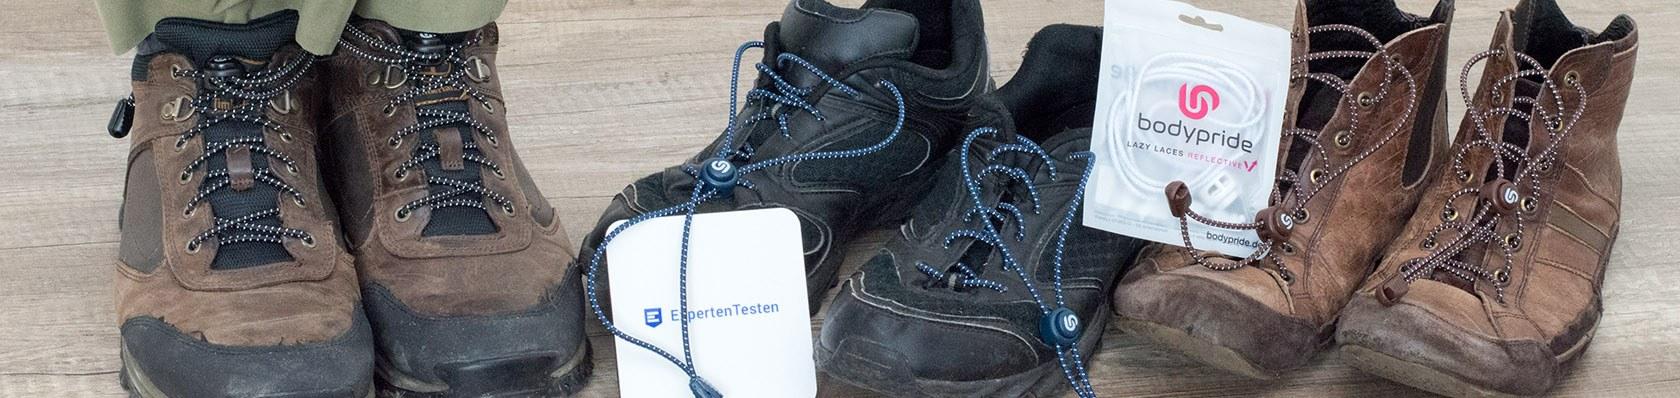 Trekkingschuhe im Test auf ExpertenTesten.de